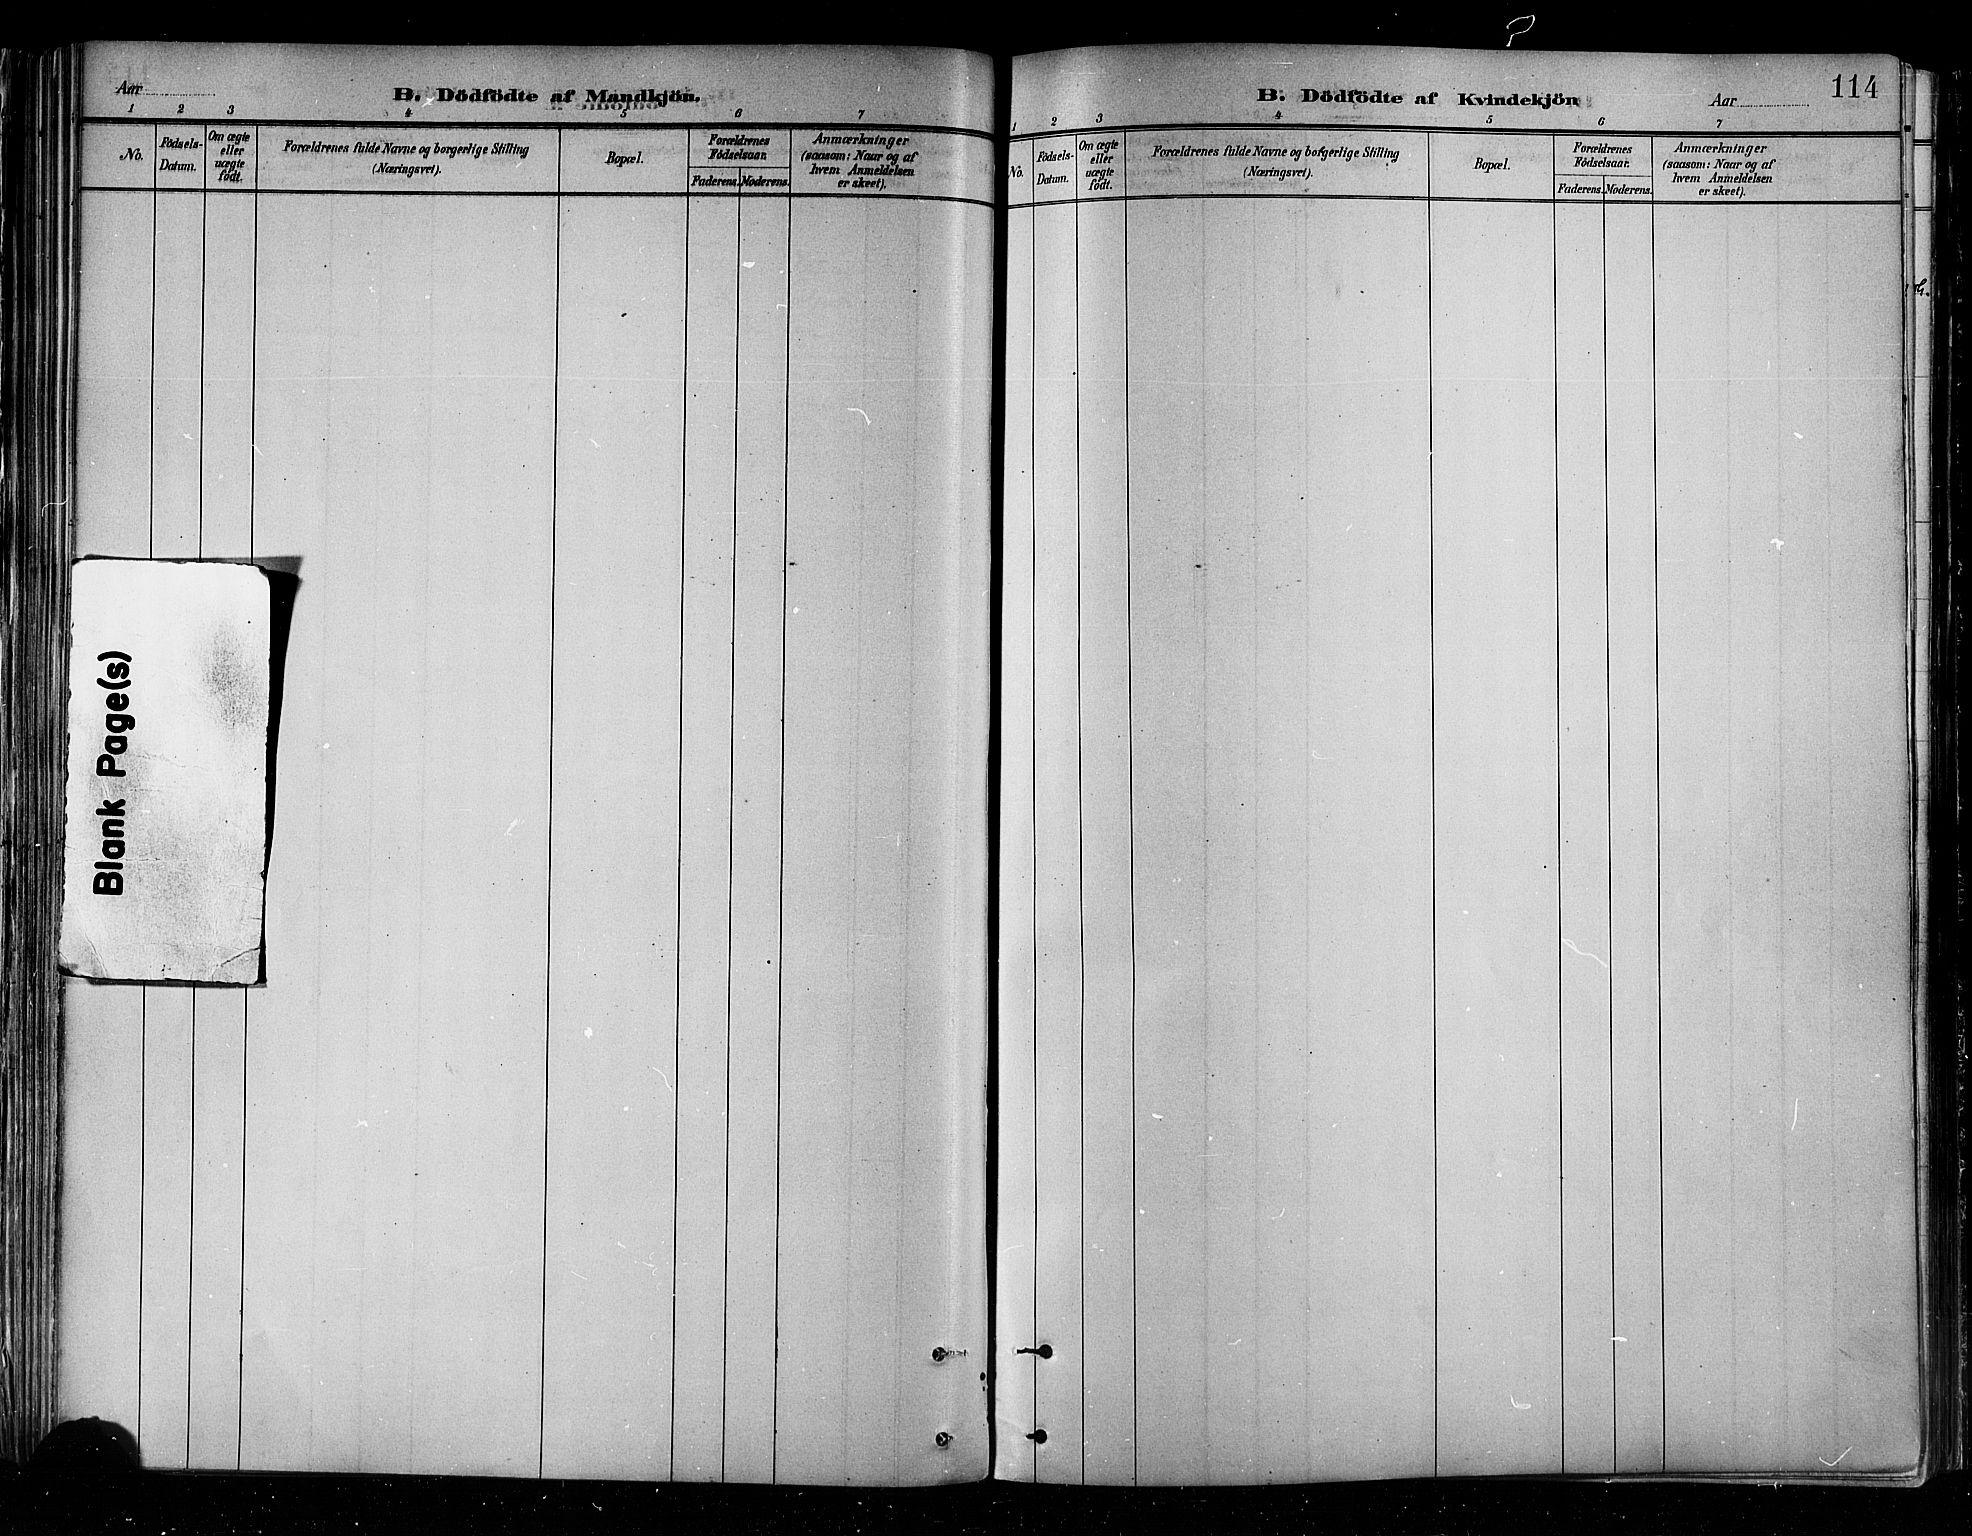 SATØ, Skjervøy sokneprestkontor, H/Ha/Haa/L0010kirke: Ministerialbok nr. 10, 1887-1898, s. 114